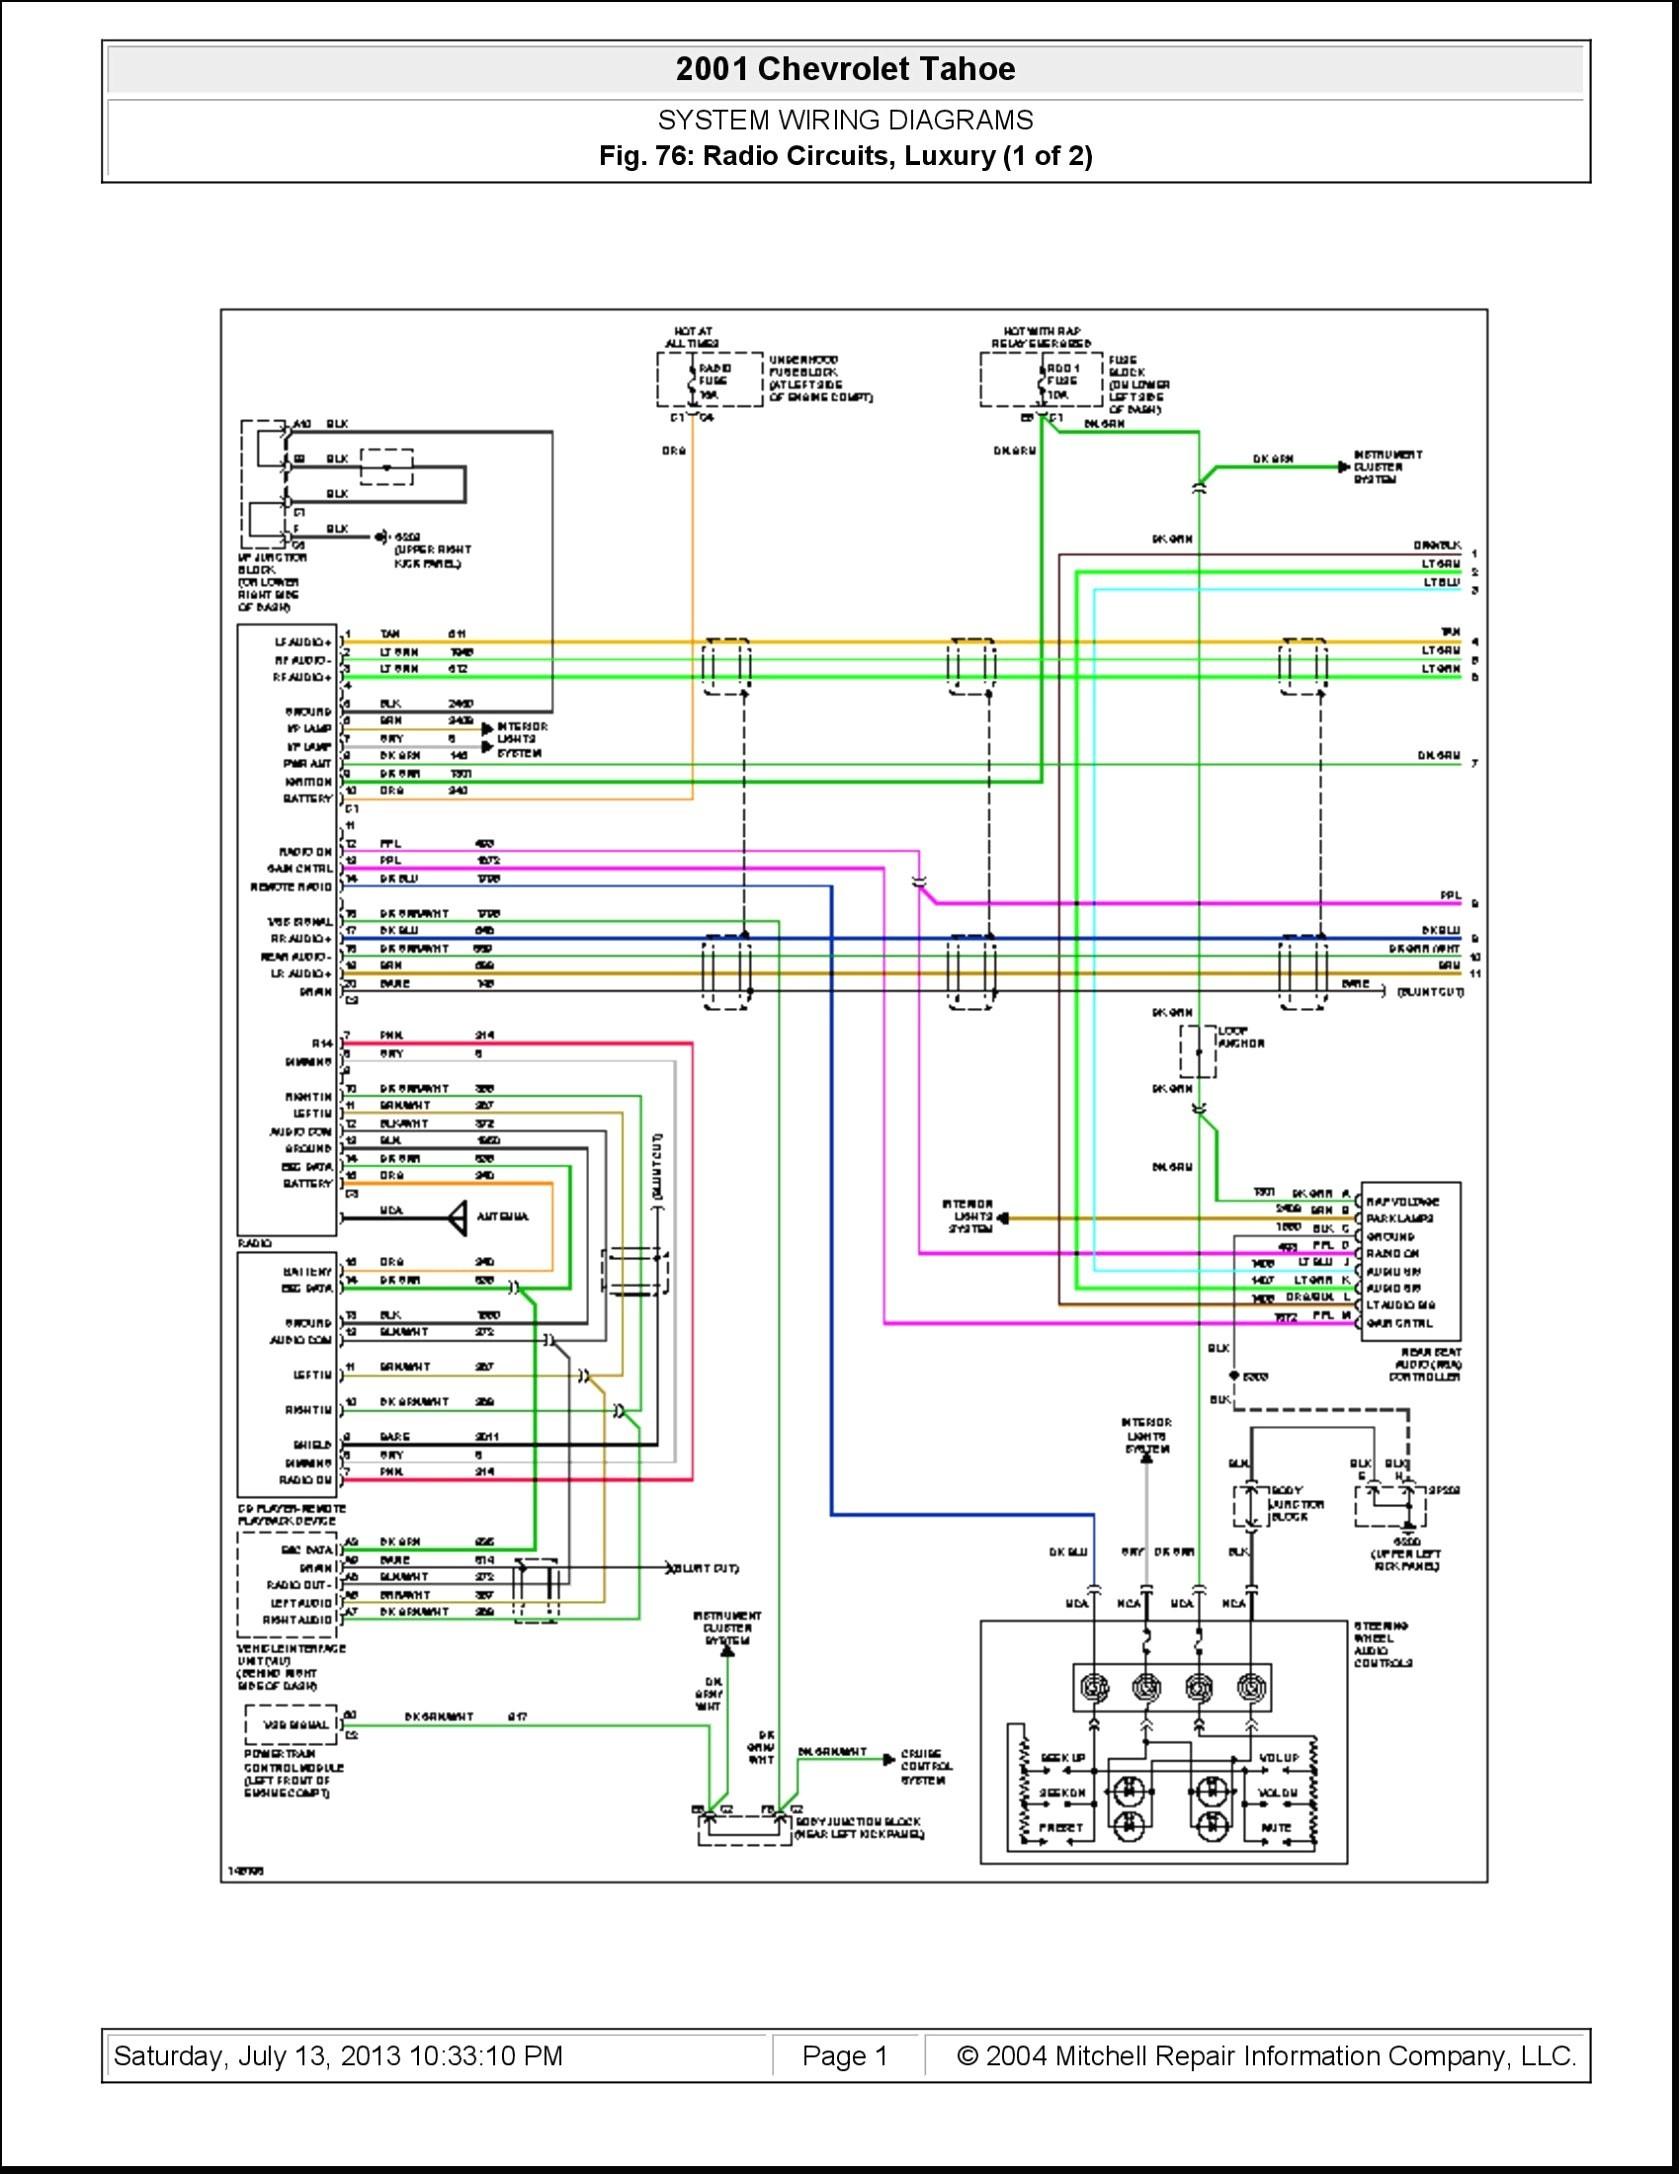 2012 Chevy Suburban Wiring Wiring Diagram Component Component Consorziofiuggiturismo It